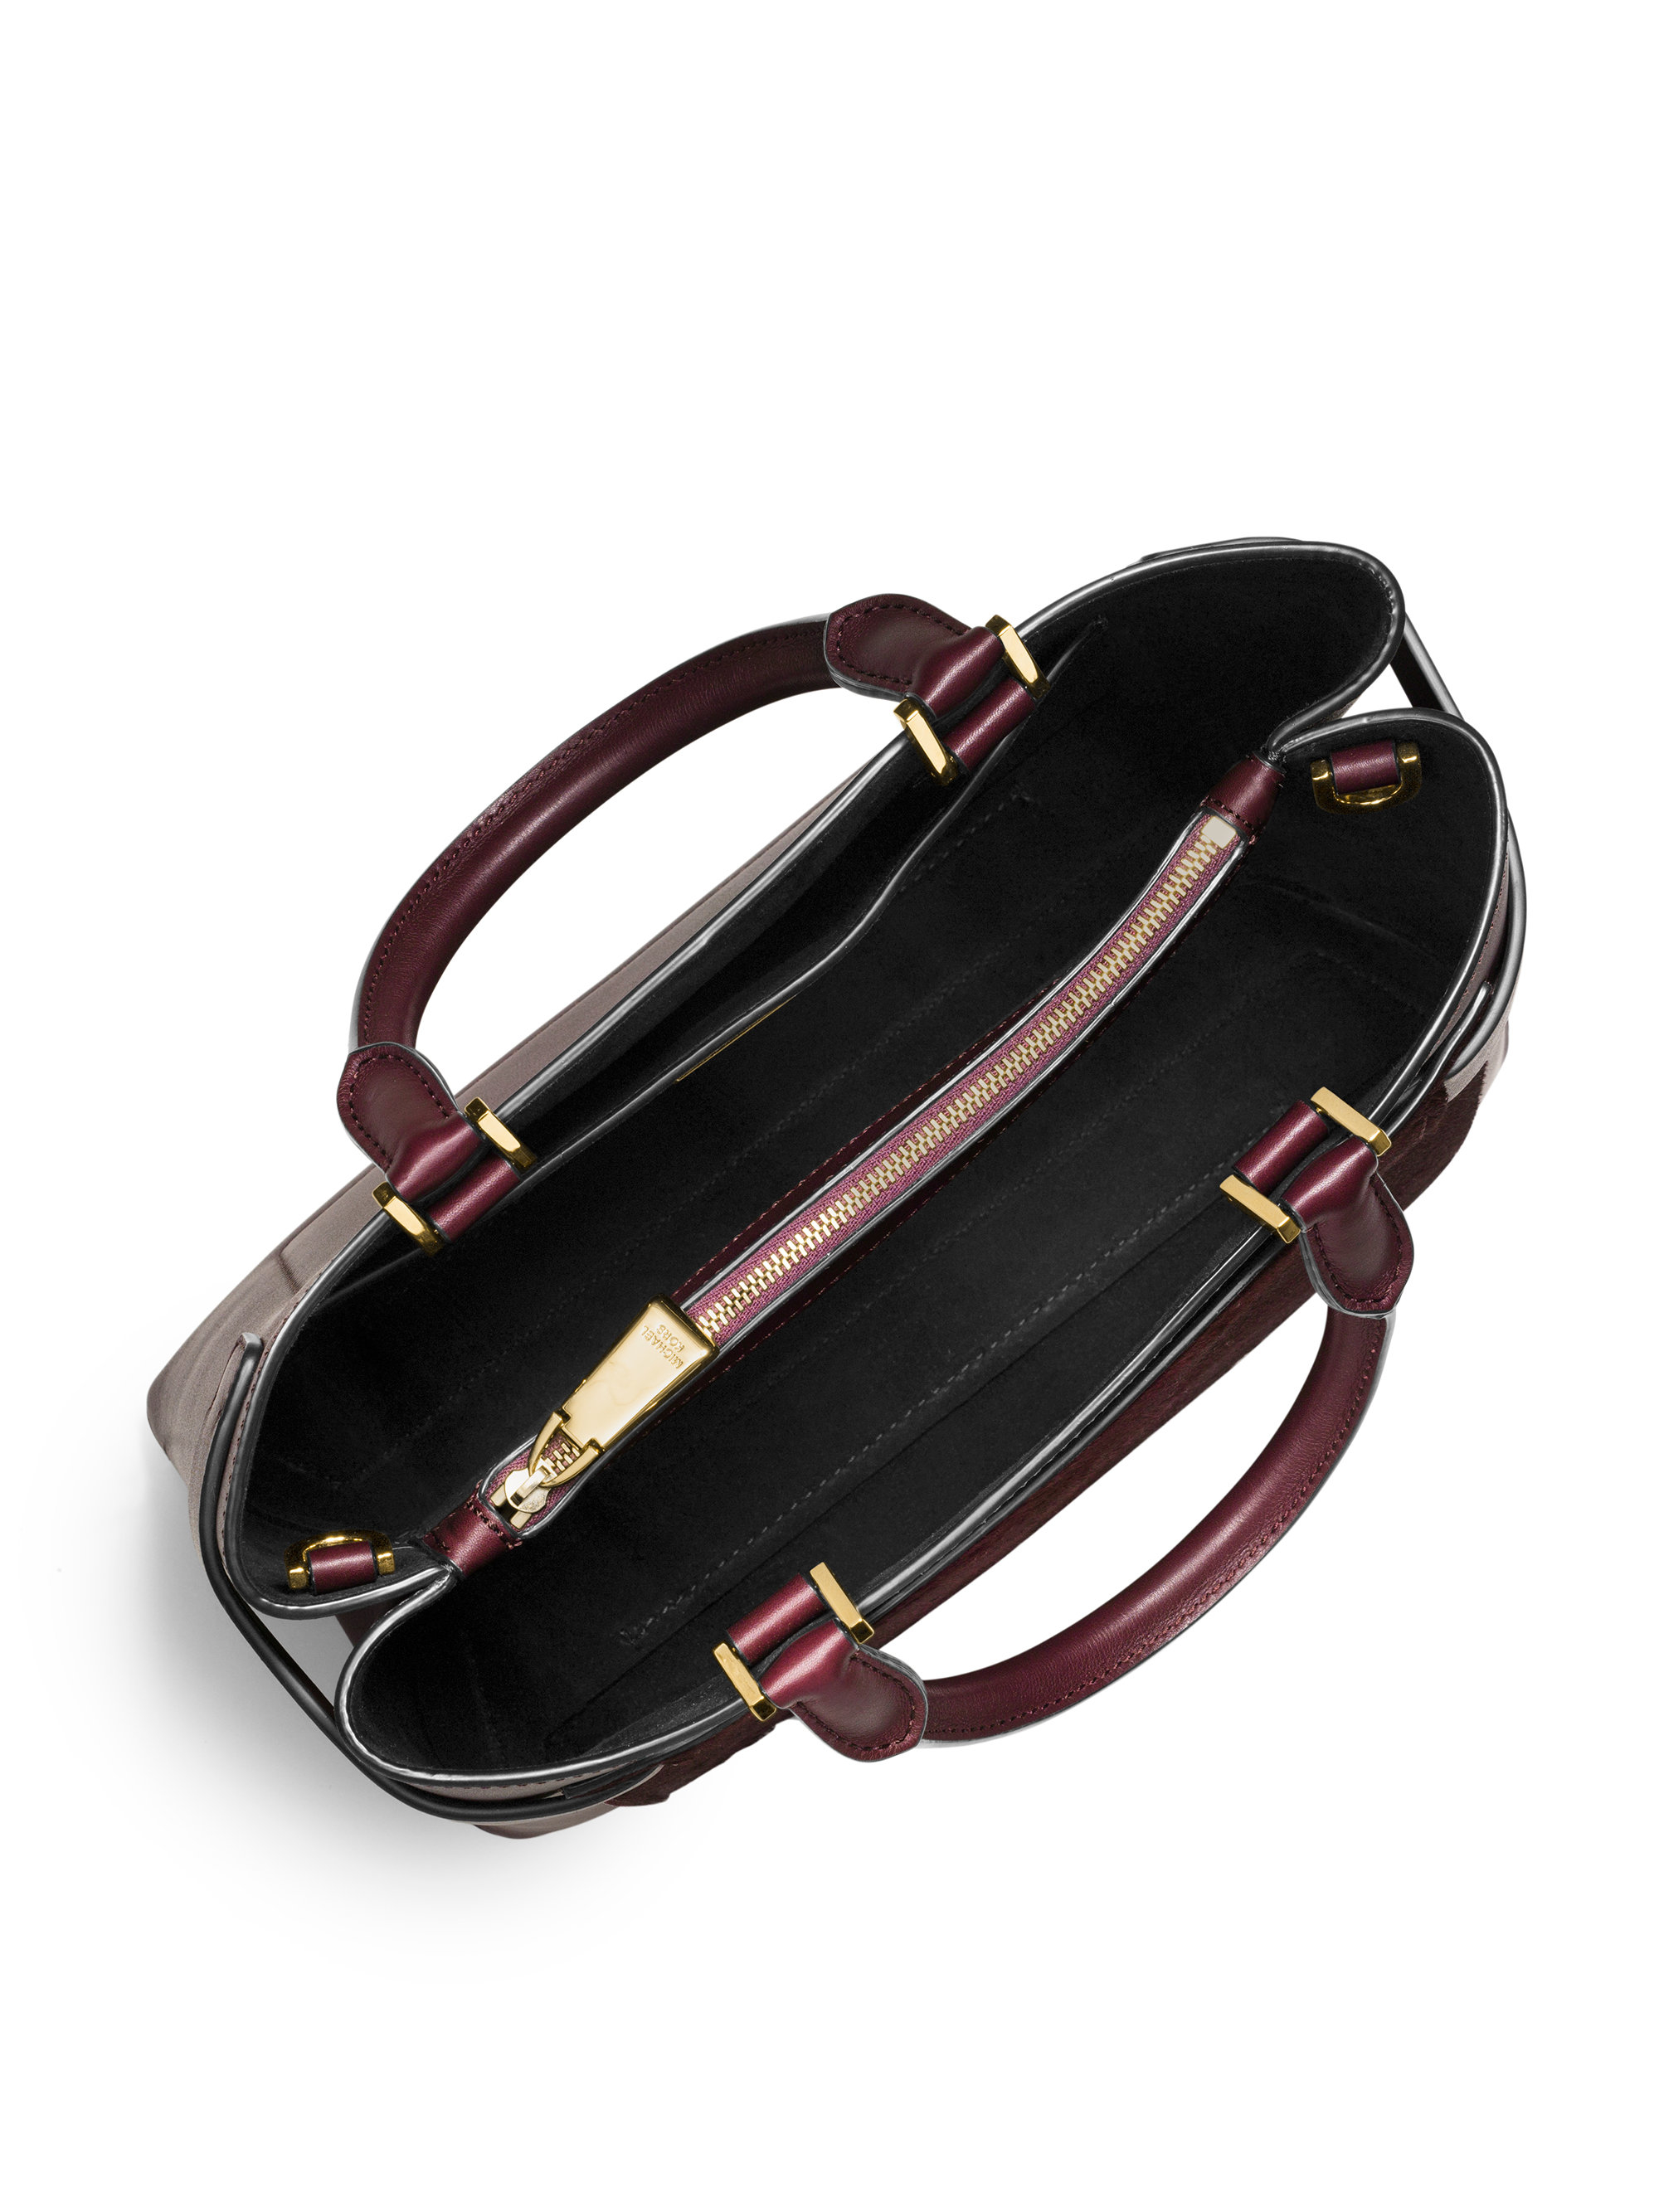 Lyst - Michael Kors Audrey Medium Calf Hair   Leather Satchel in Purple f16829c211ea9